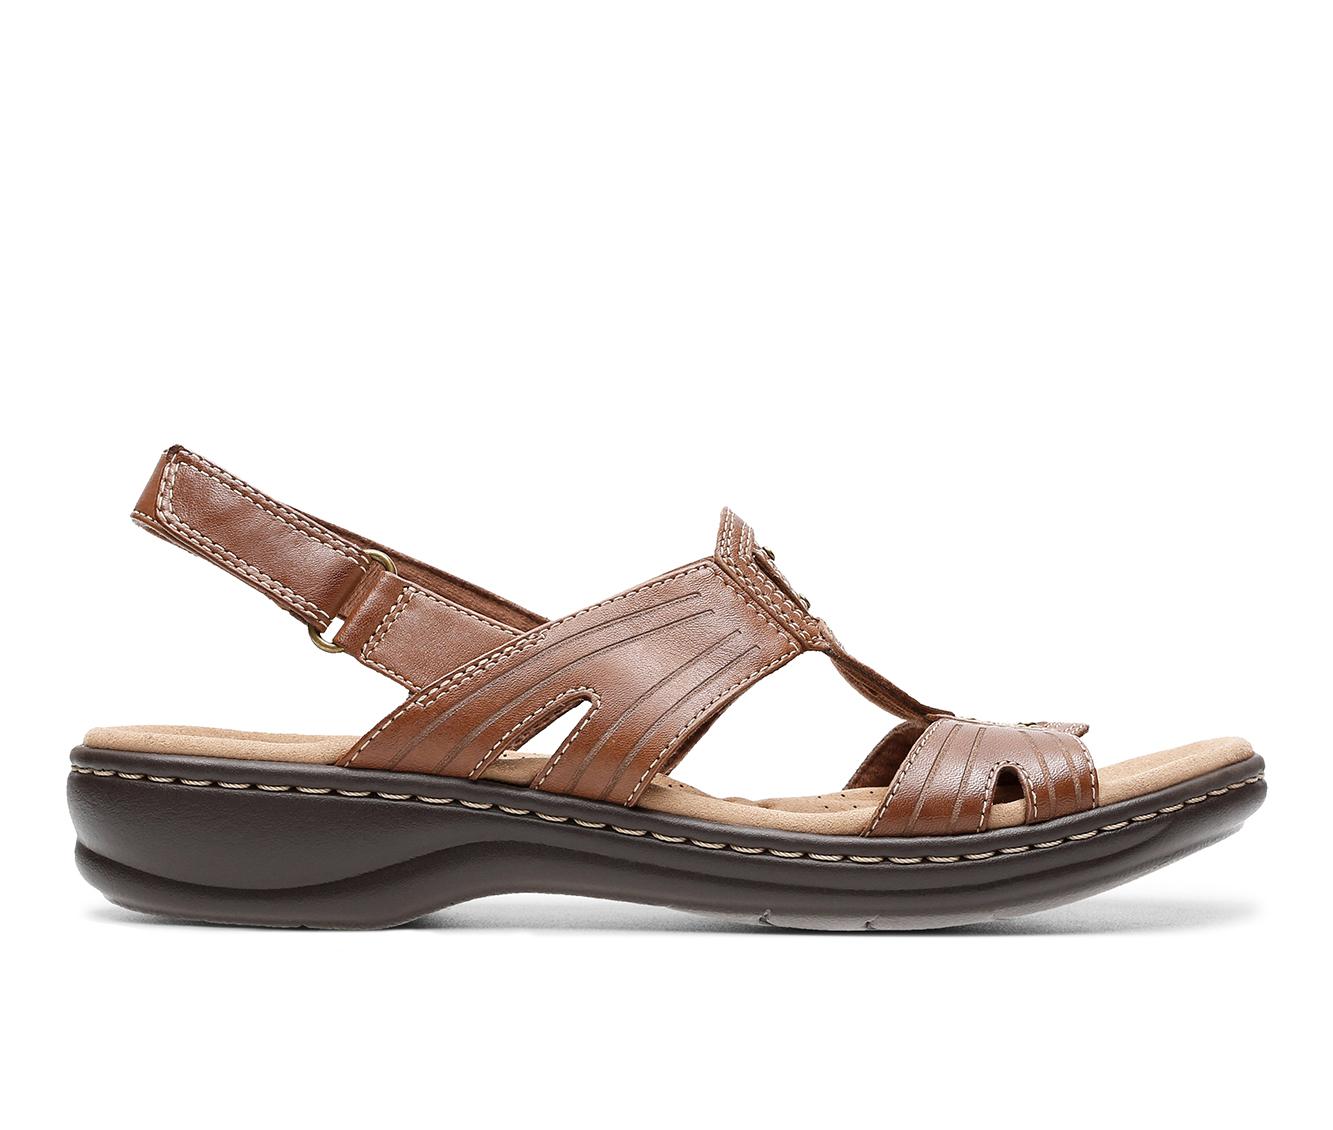 Clarks Leisa Vine Women's Sandal (Brown Leather)